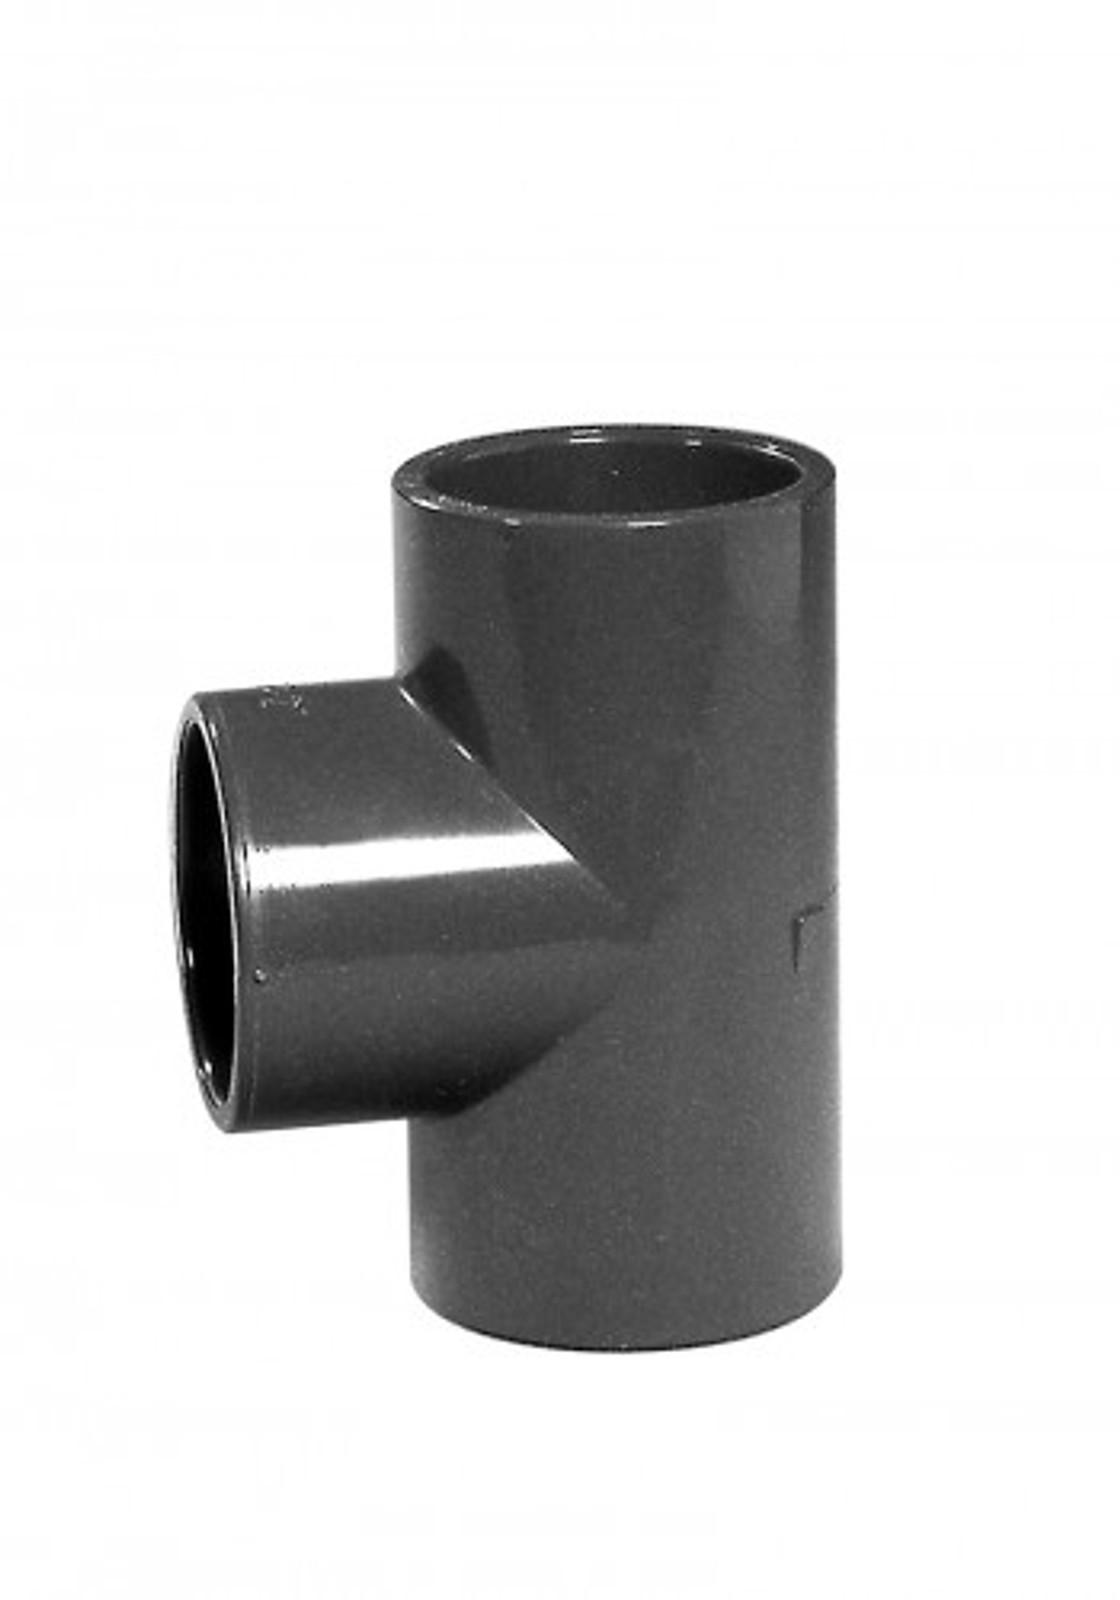 T-Stück 90°, 32 mm aus PVC